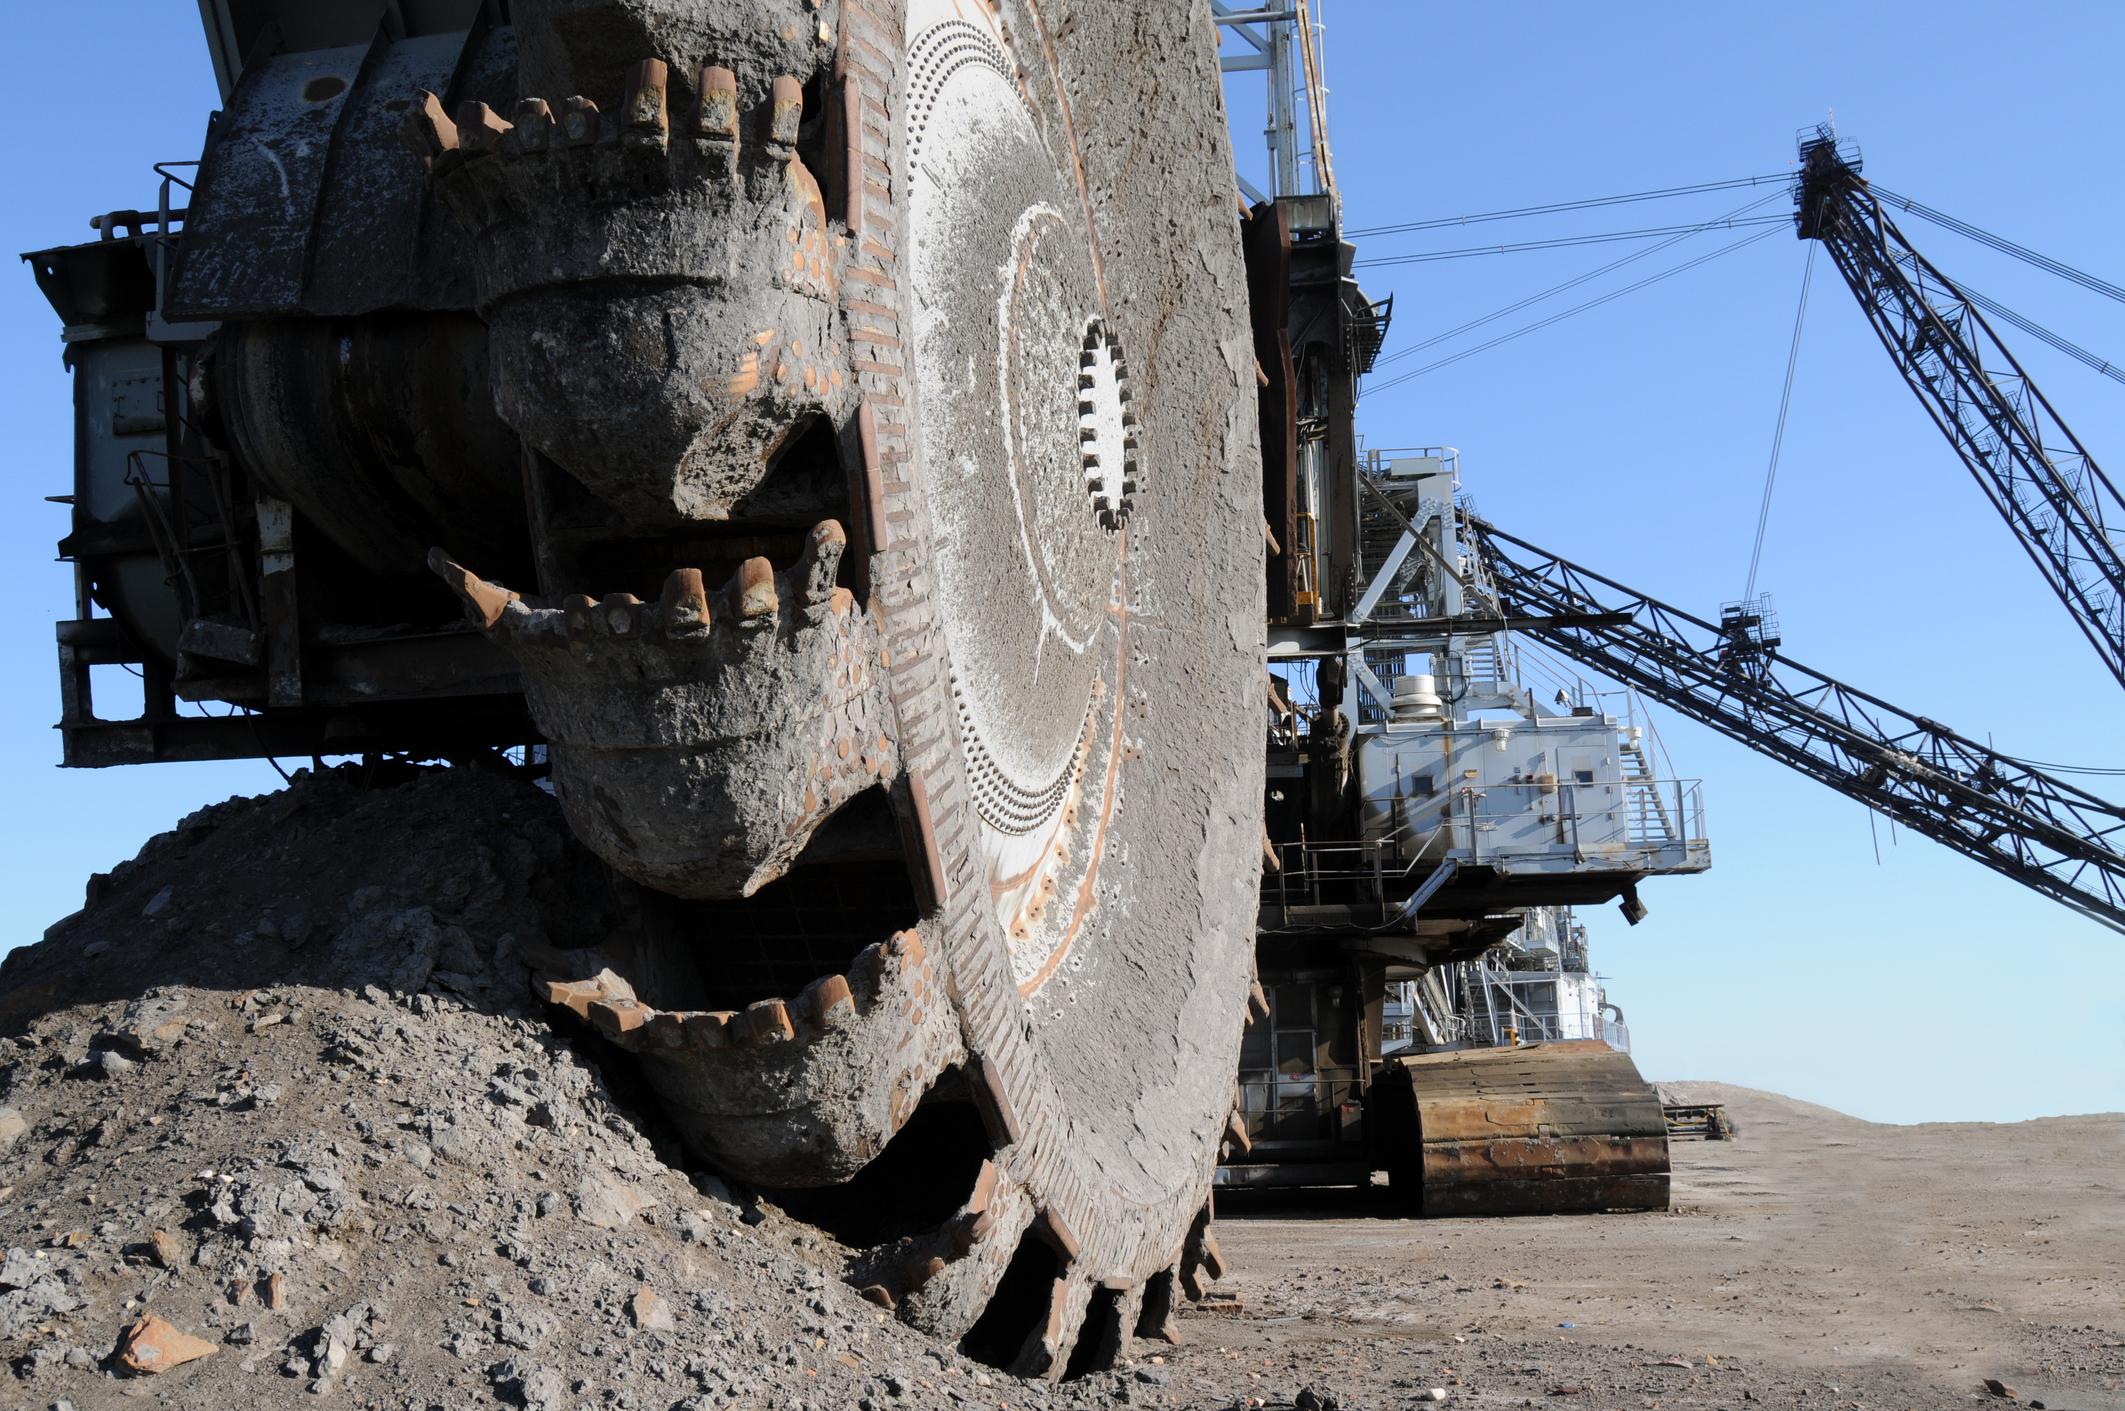 Oil sands mining equipment